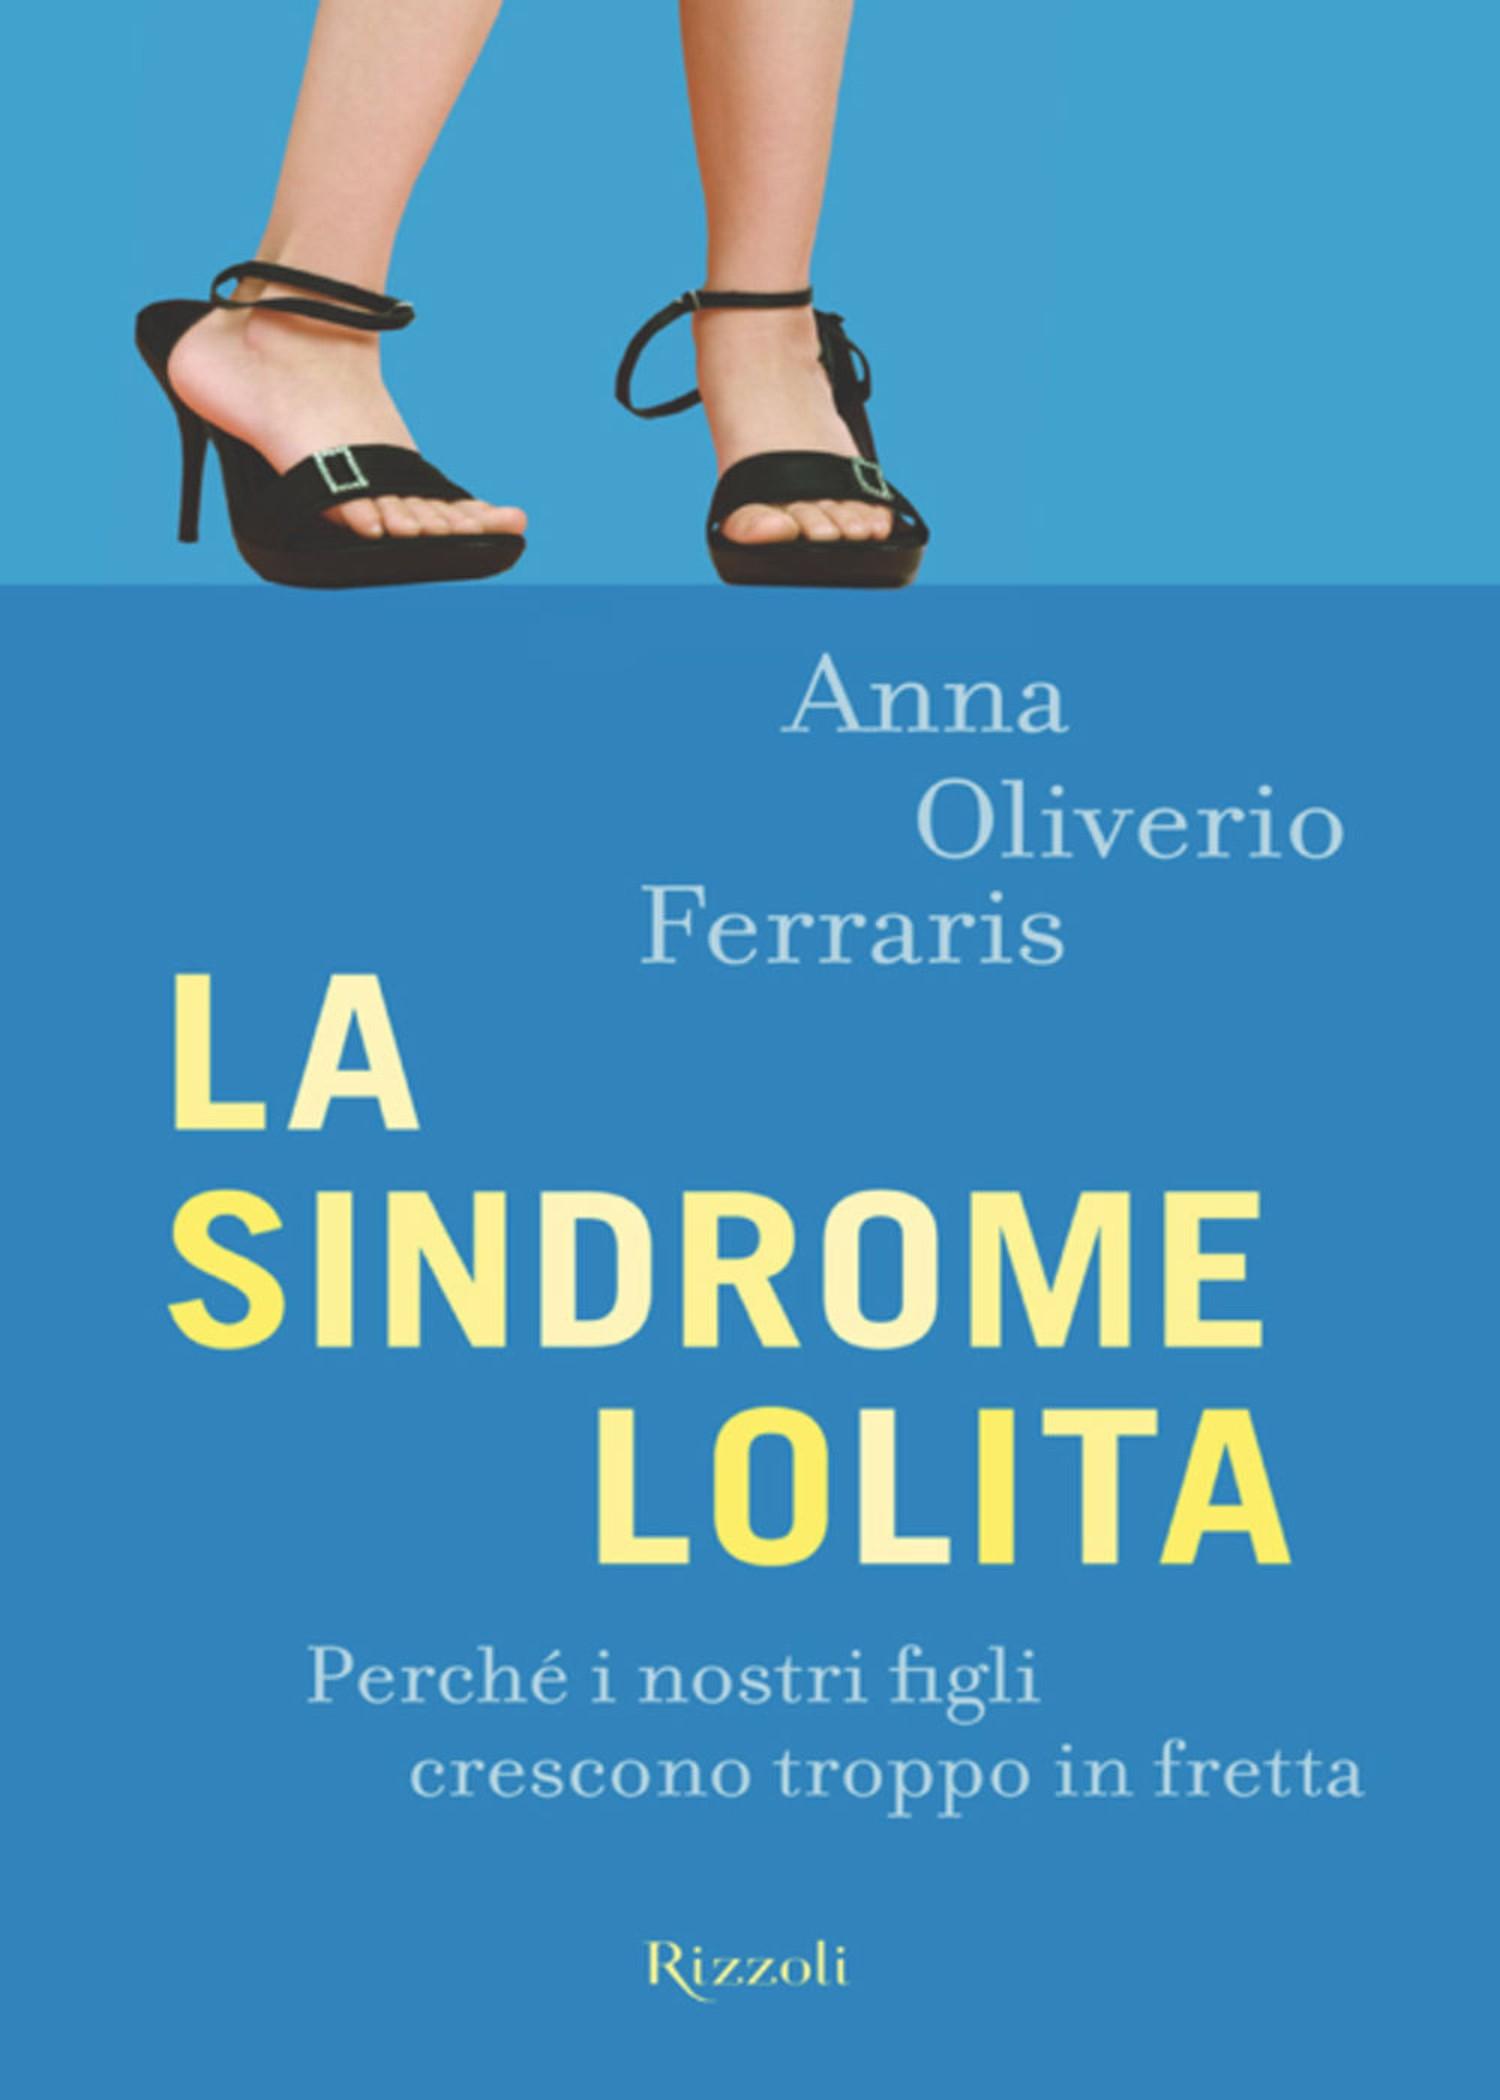 Book Cover Images Api : La sindrome lolita anna oliverio ferraris ebook